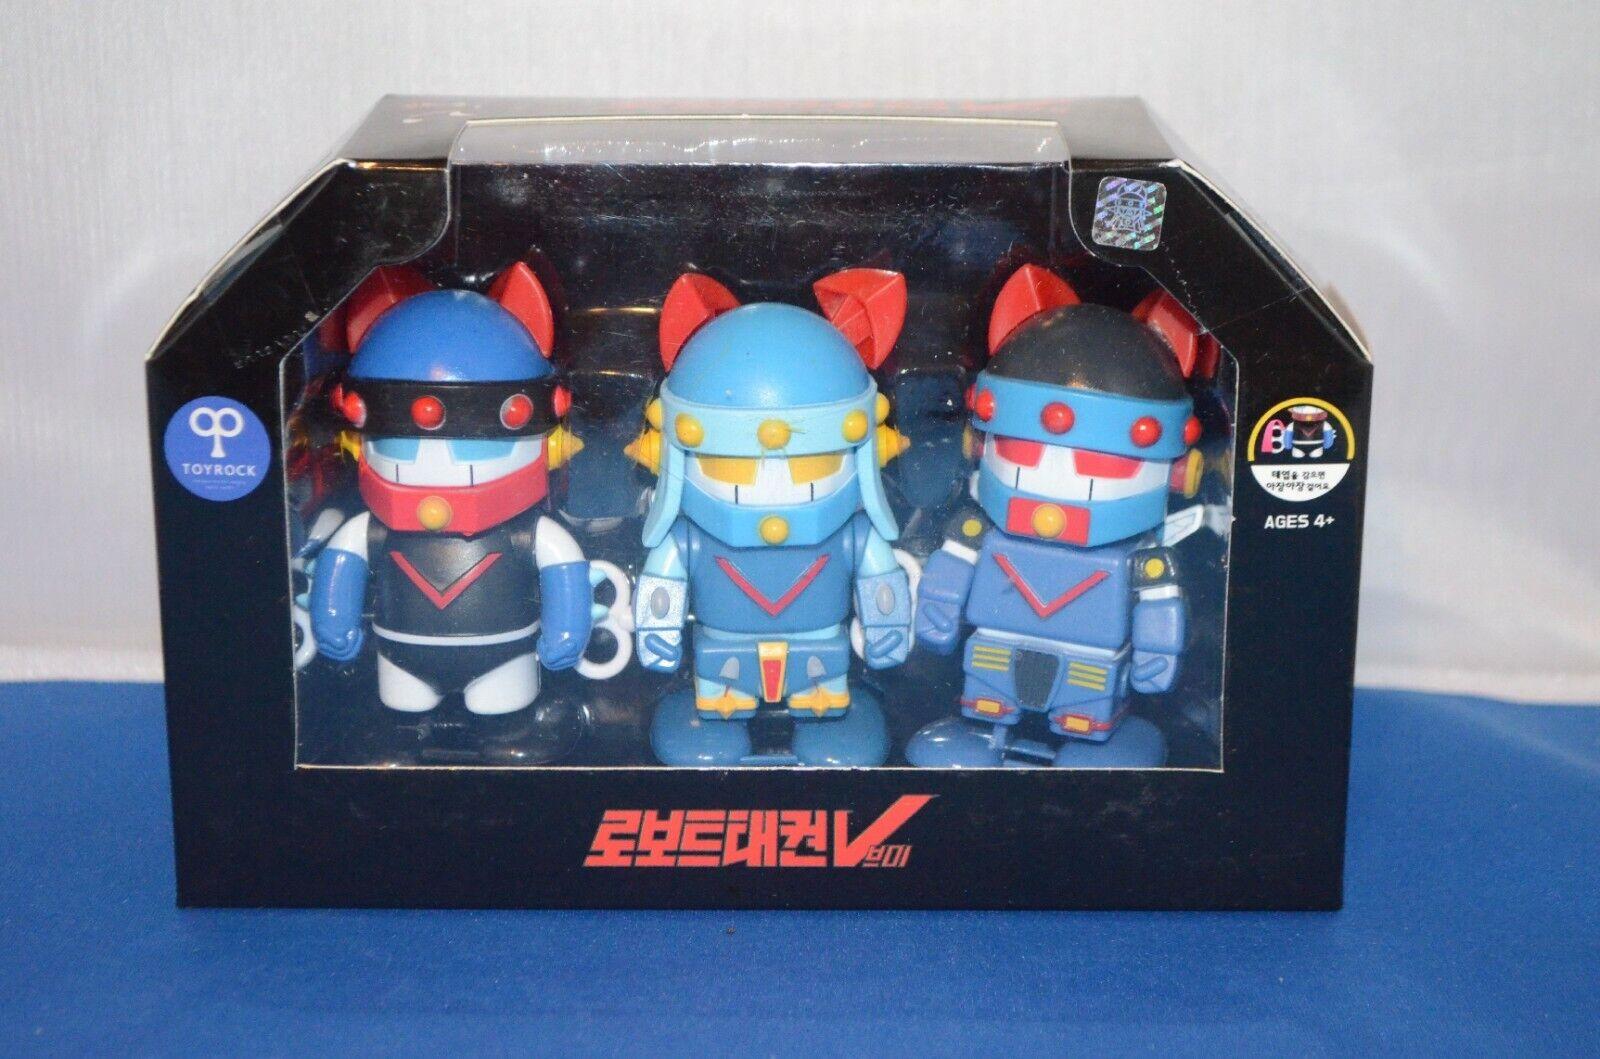 3 specialee Wind Up Robot TAEKWON V edizione Shogun giocattoli